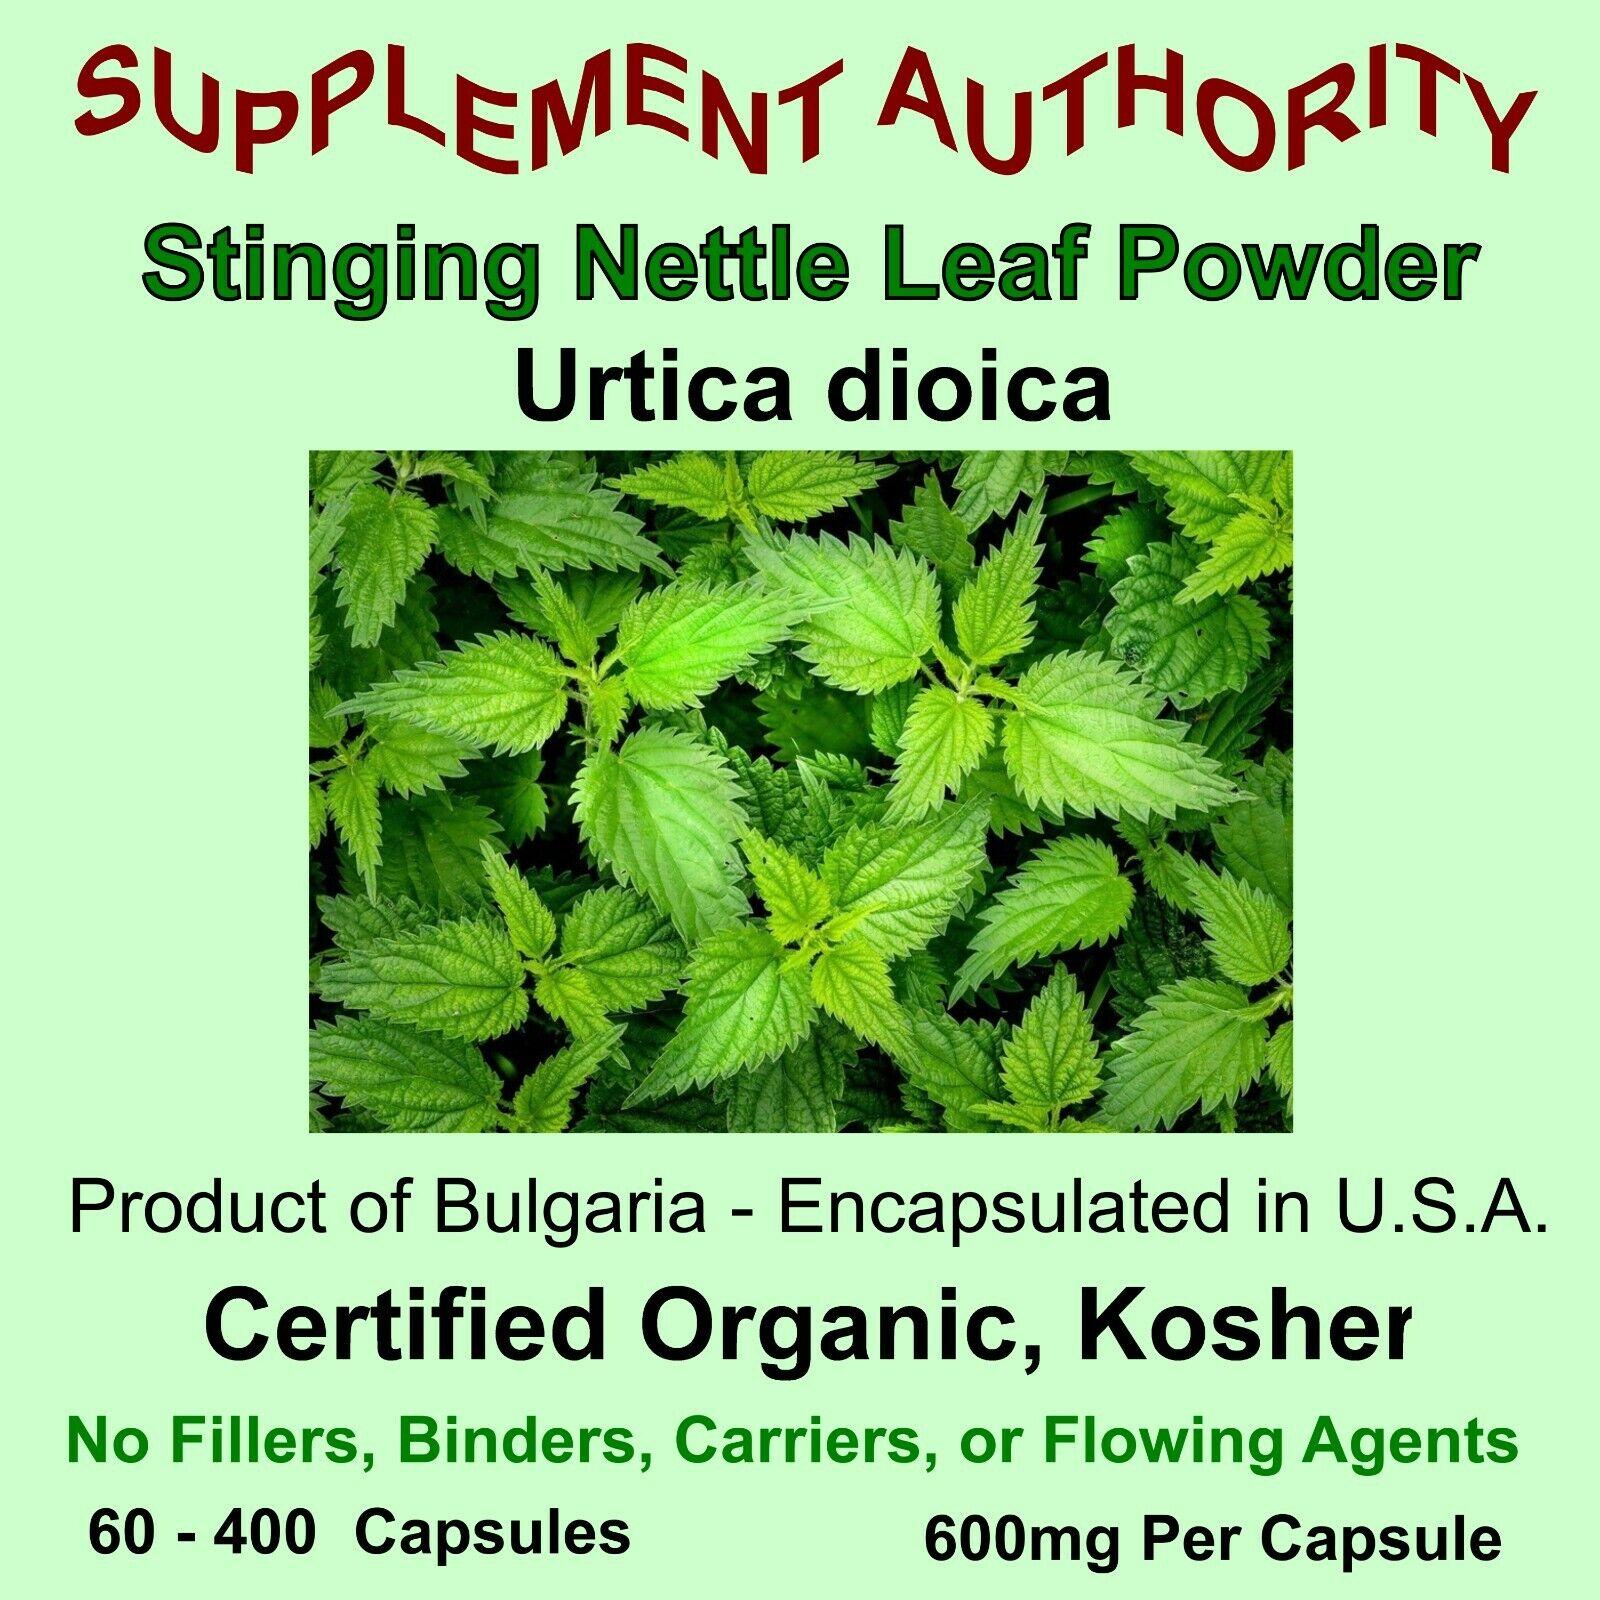 Stinging Nettle Leaf Powder Capsules - Certified Organic, Kosher - NEW & FRESH!